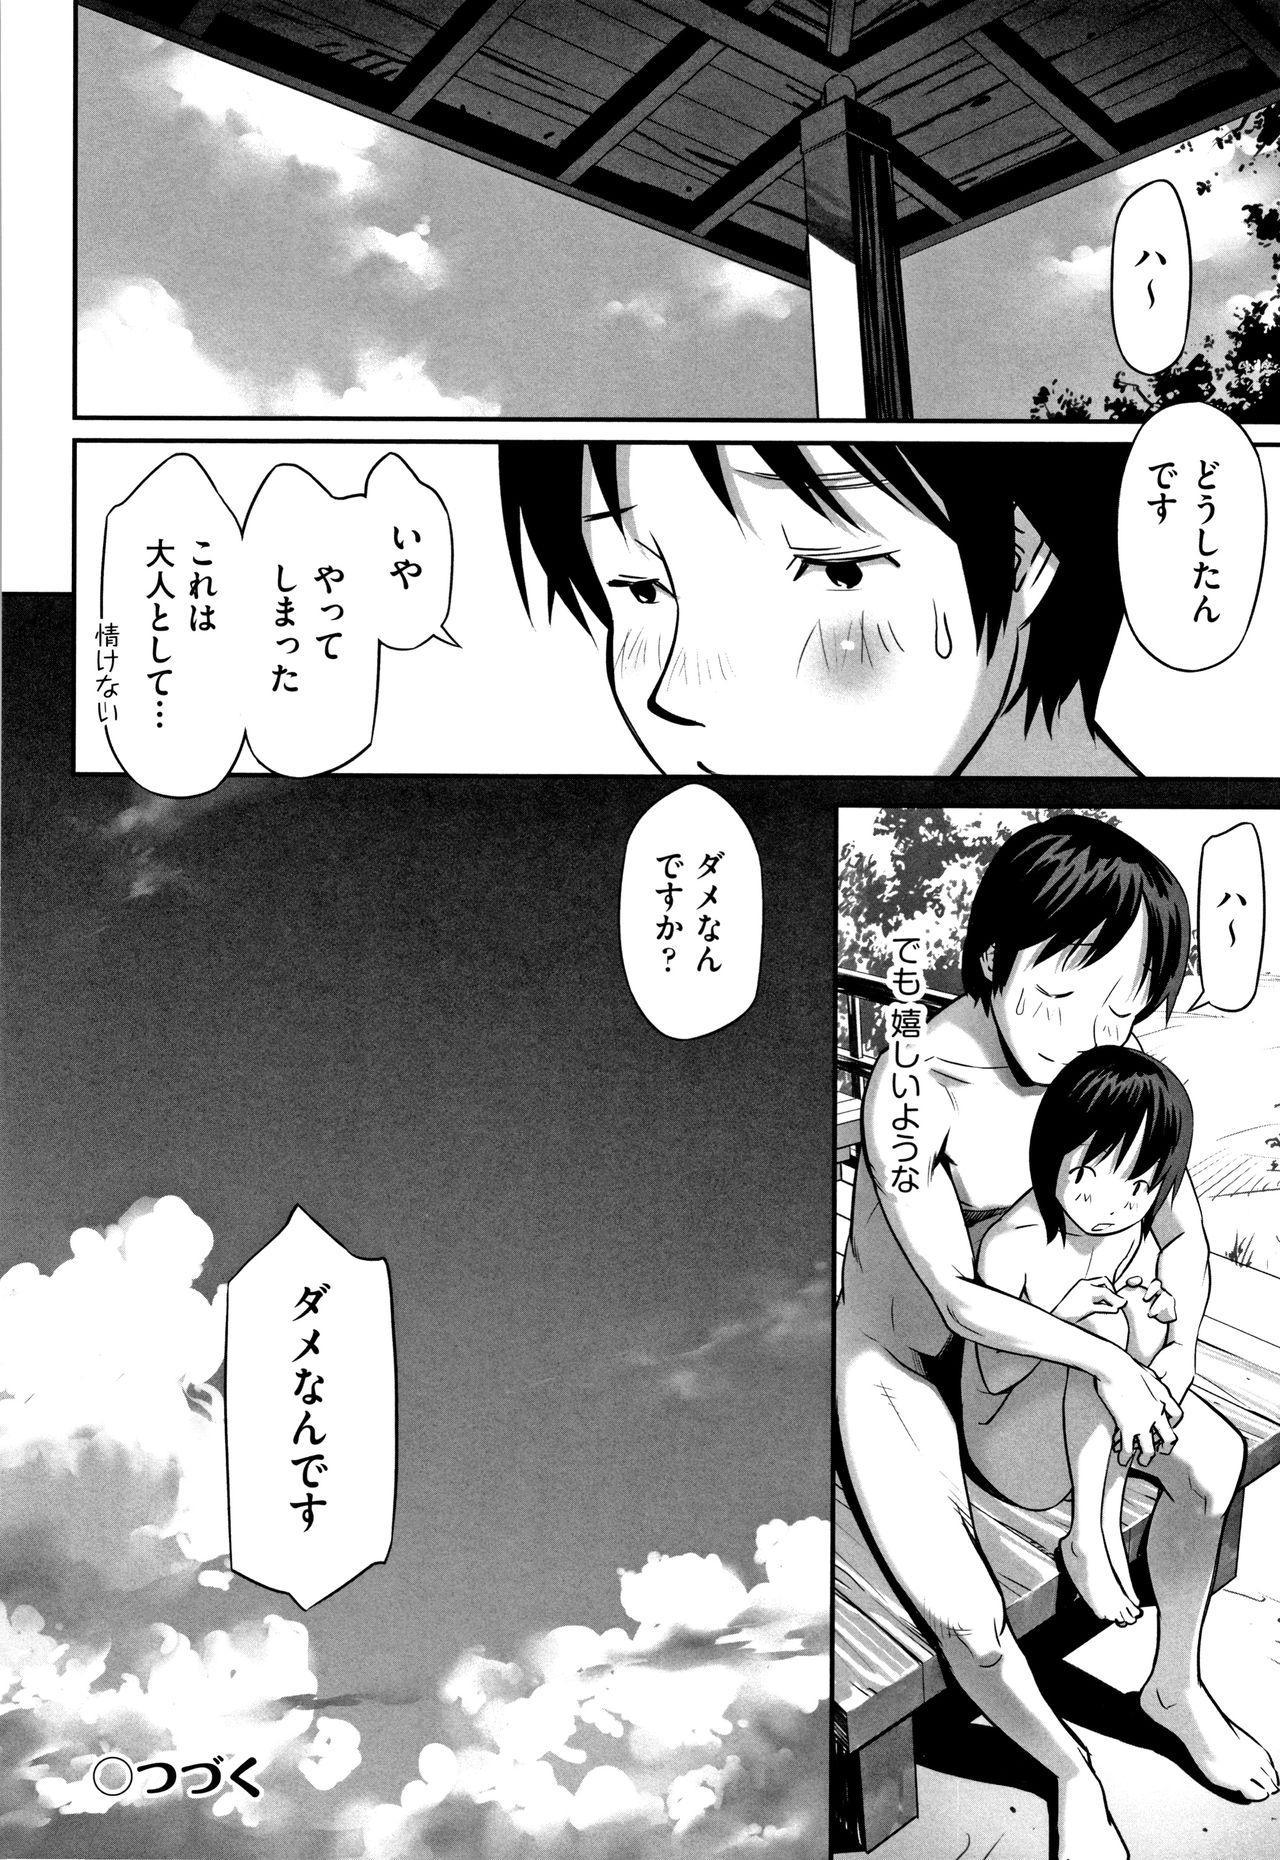 Shoujo Kumikyoku 11 178